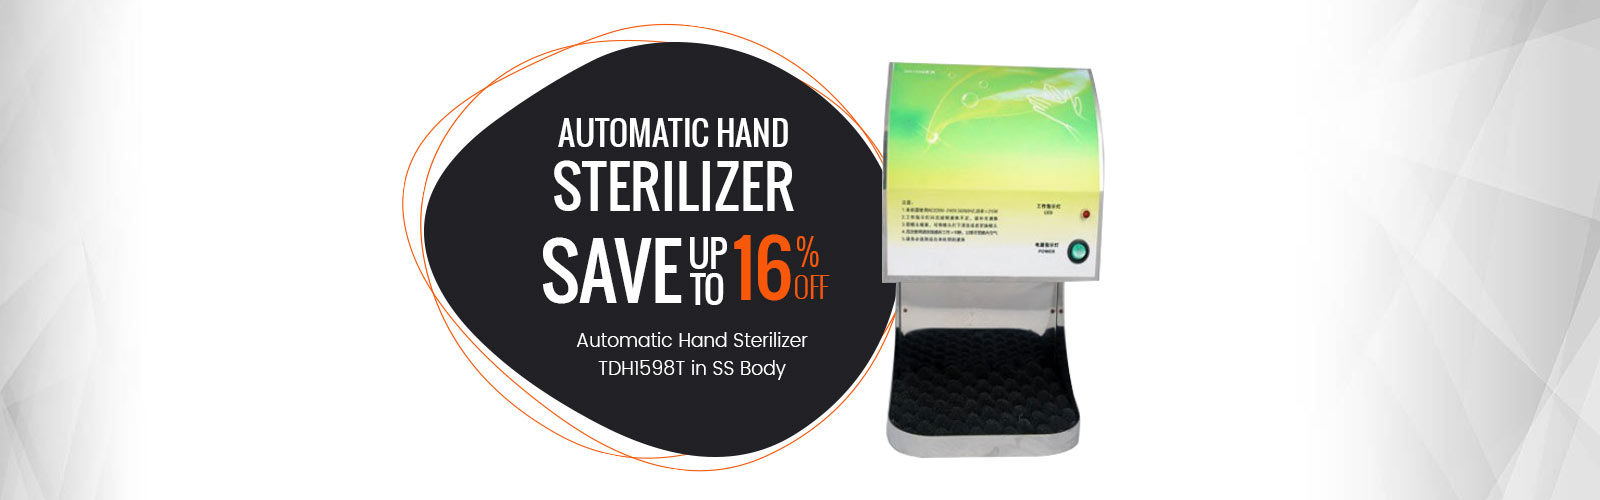 Maximize Hygiene <span> Automatic Hand Sterilizer